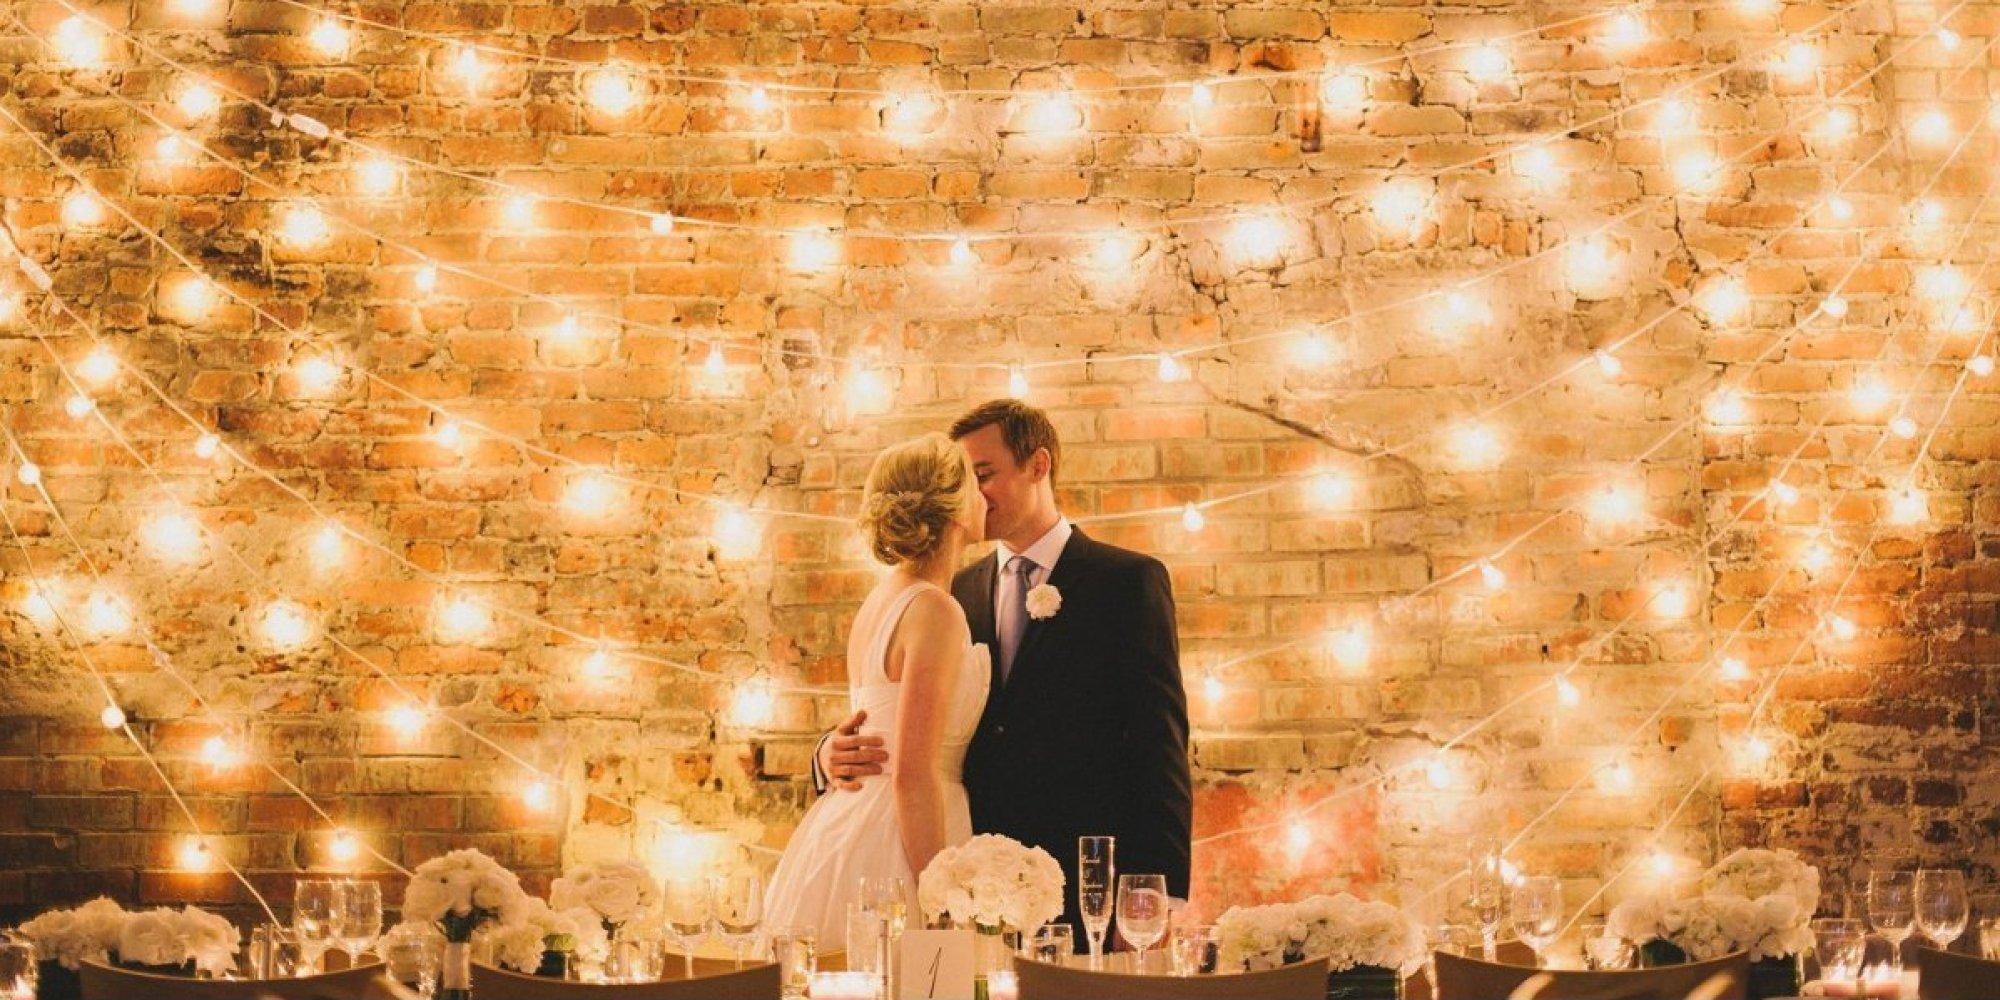 Wedding lighting ideas for receptions